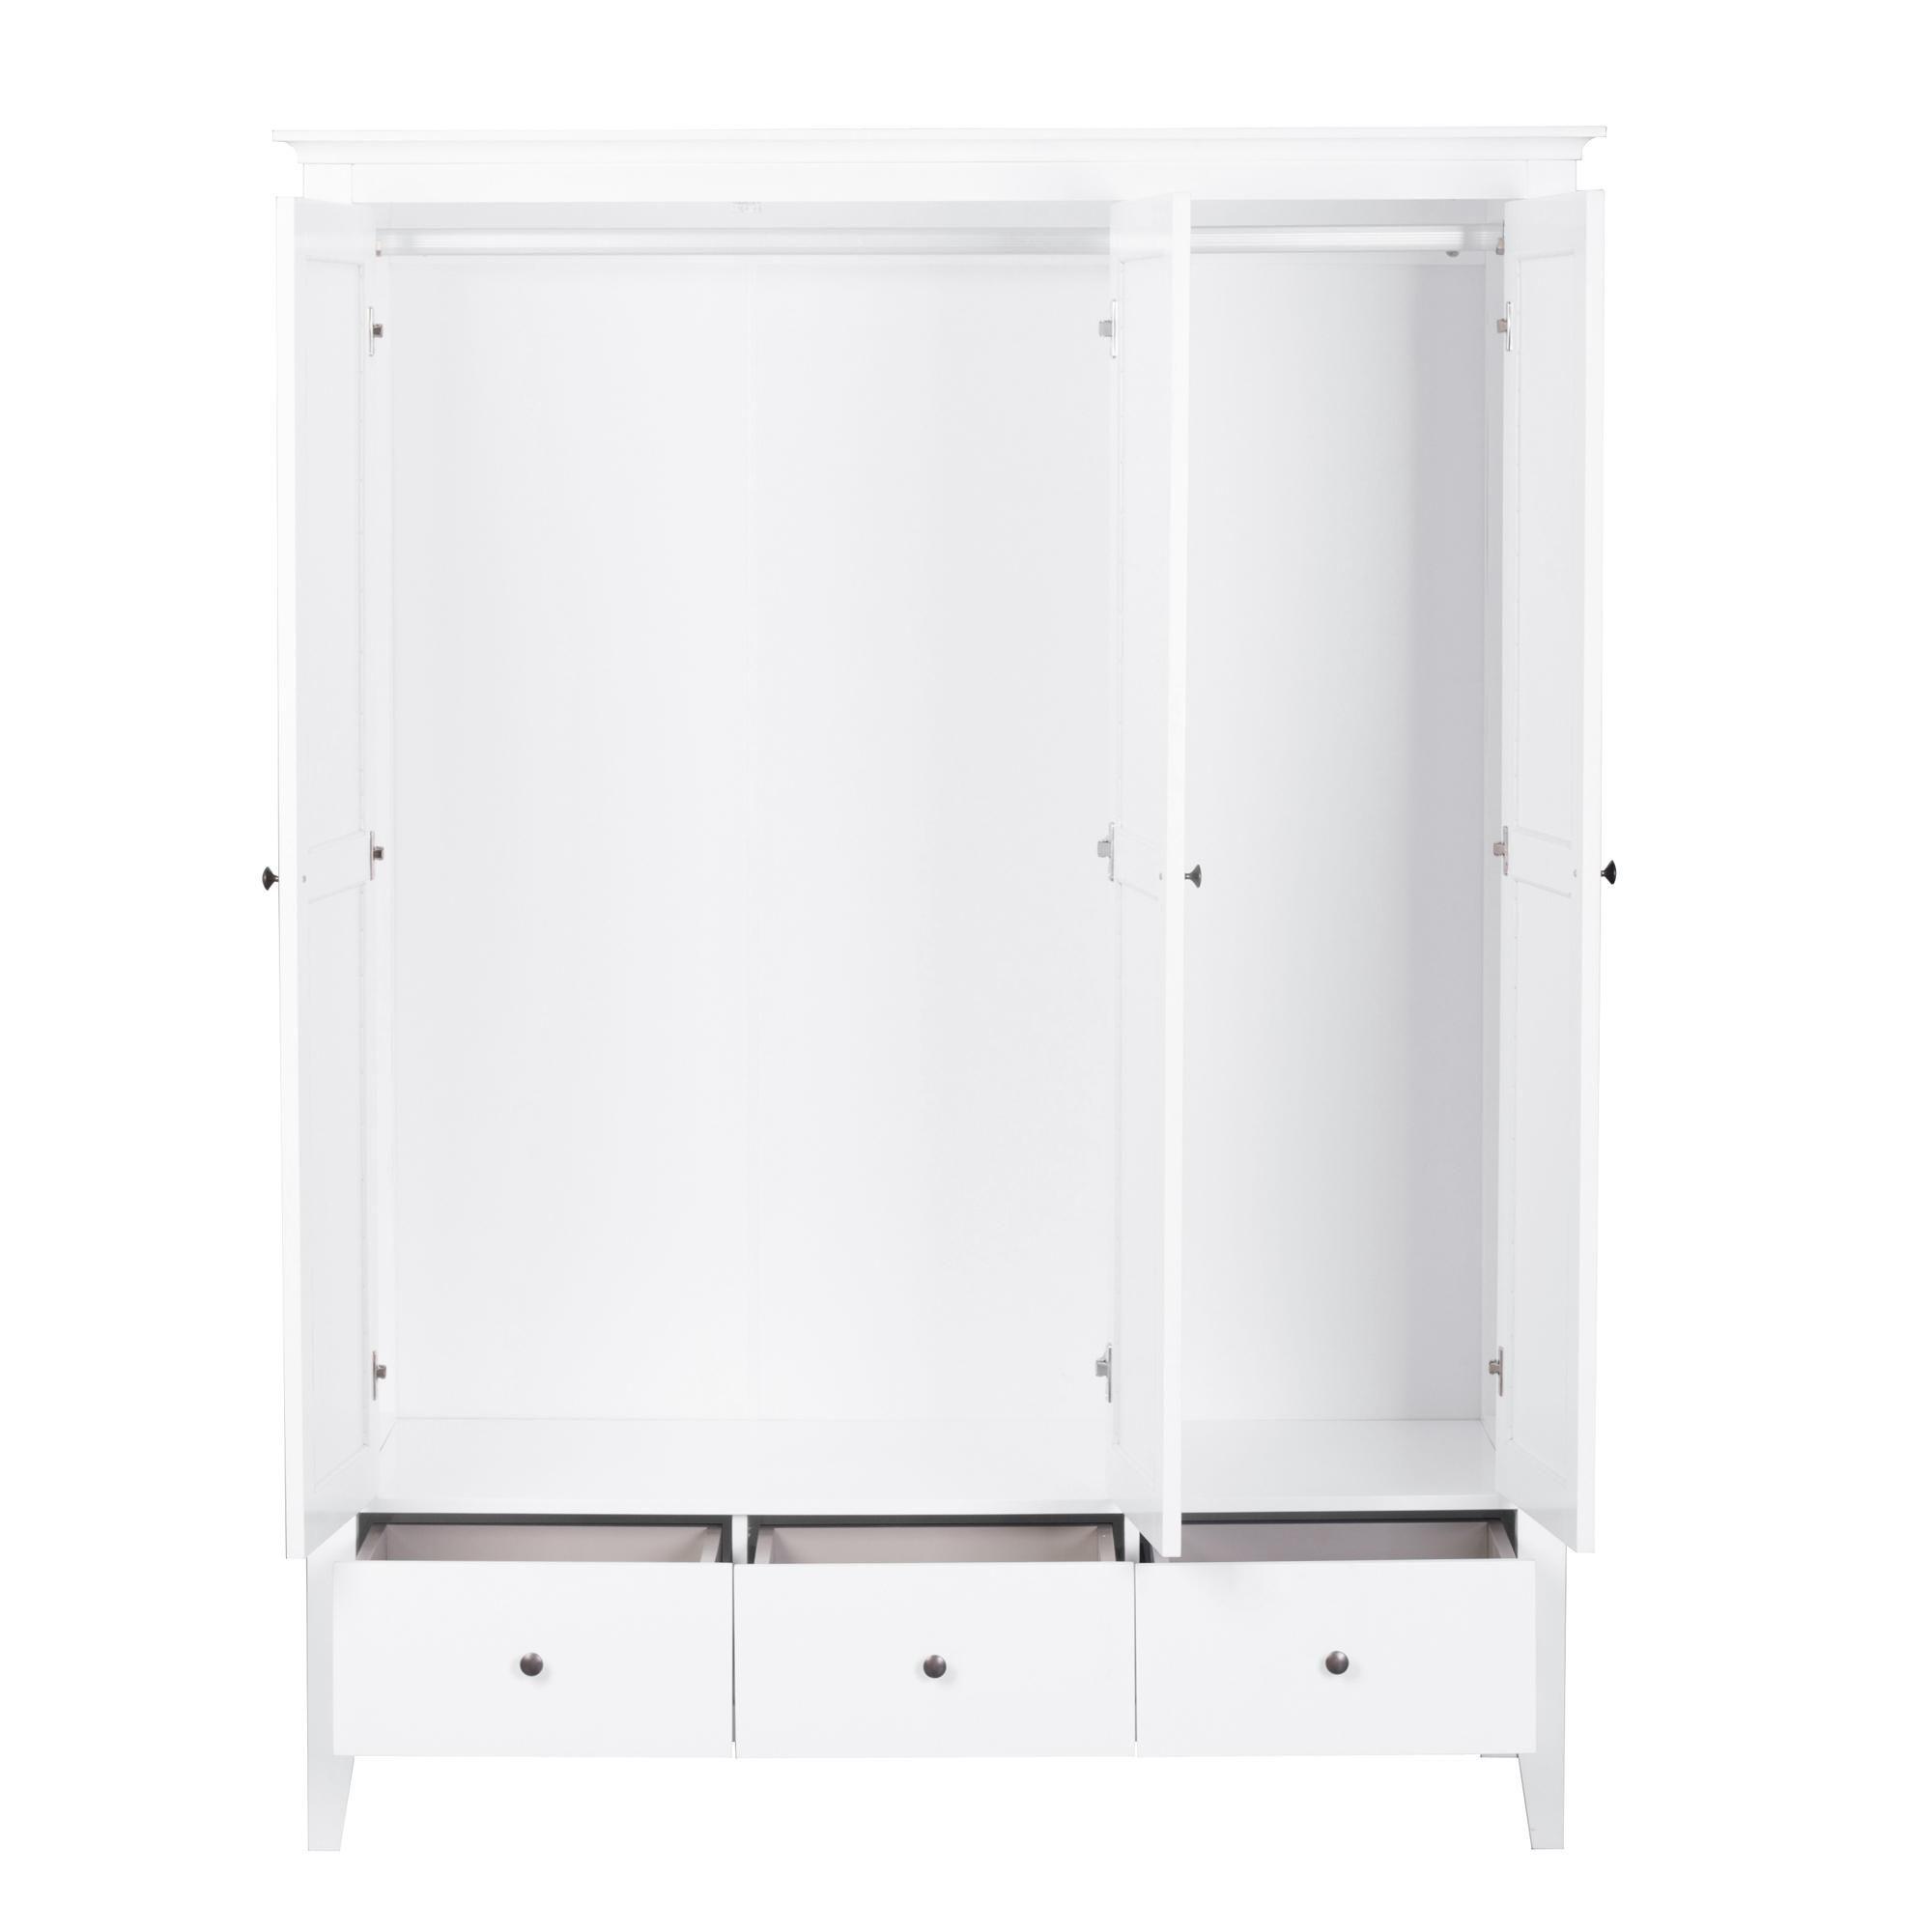 Lynton White Triple Wardrobe In 2020 Triple Wardrobe Tall Cabinet Storage Hanging Rail